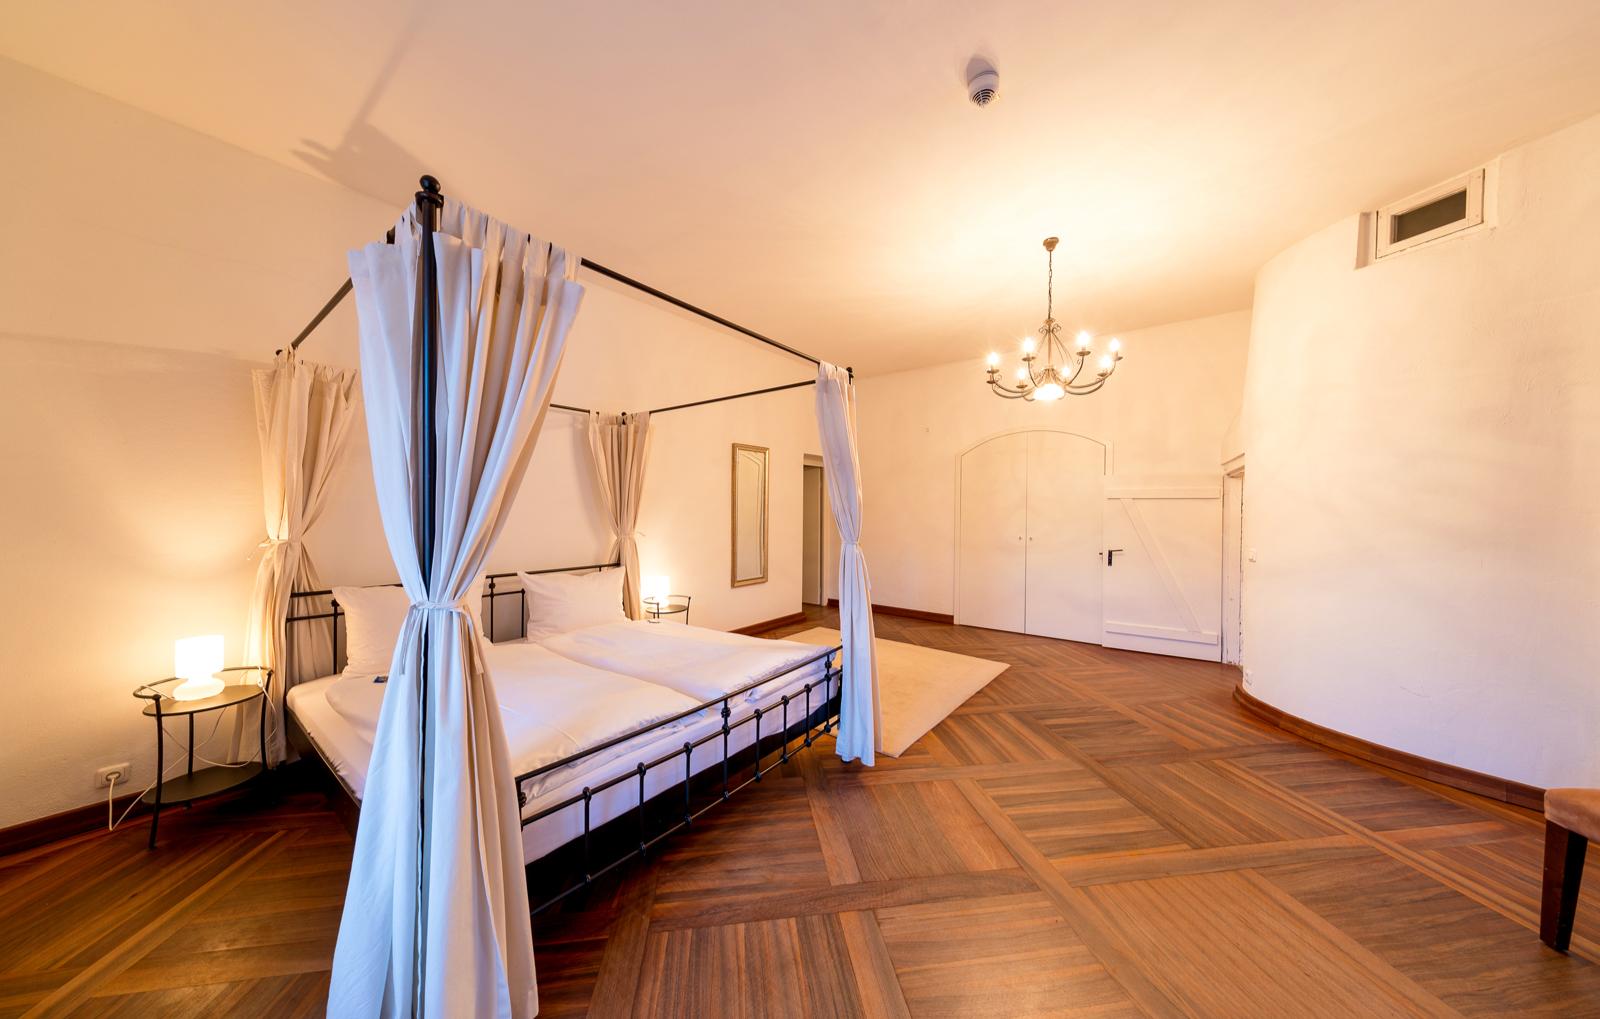 schlosshotels-arnstorf-mariakirchen-bg21625483230